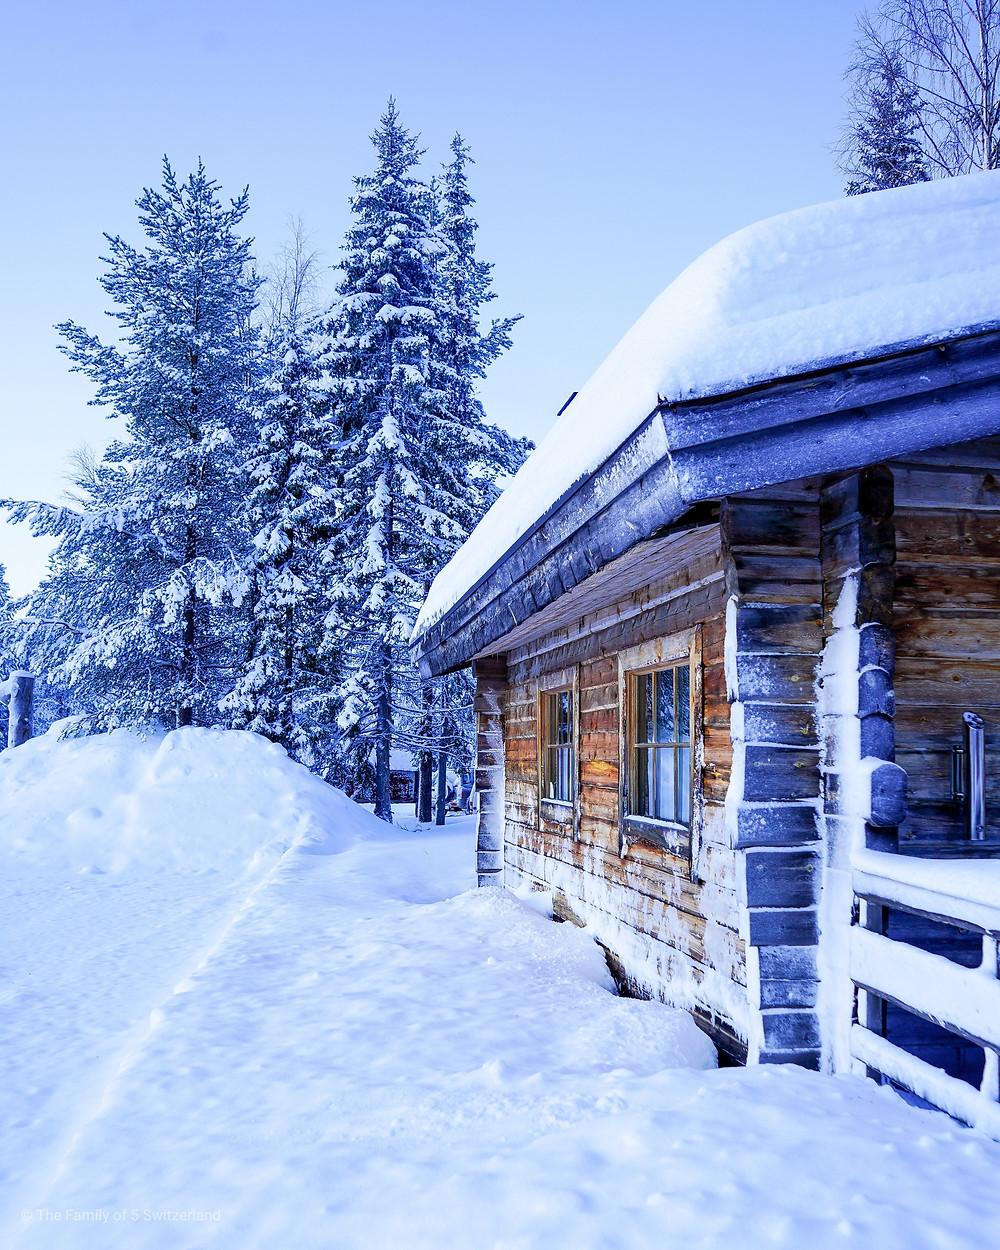 One week in Luosto Lapland Finland with Kontiki from Switzerland